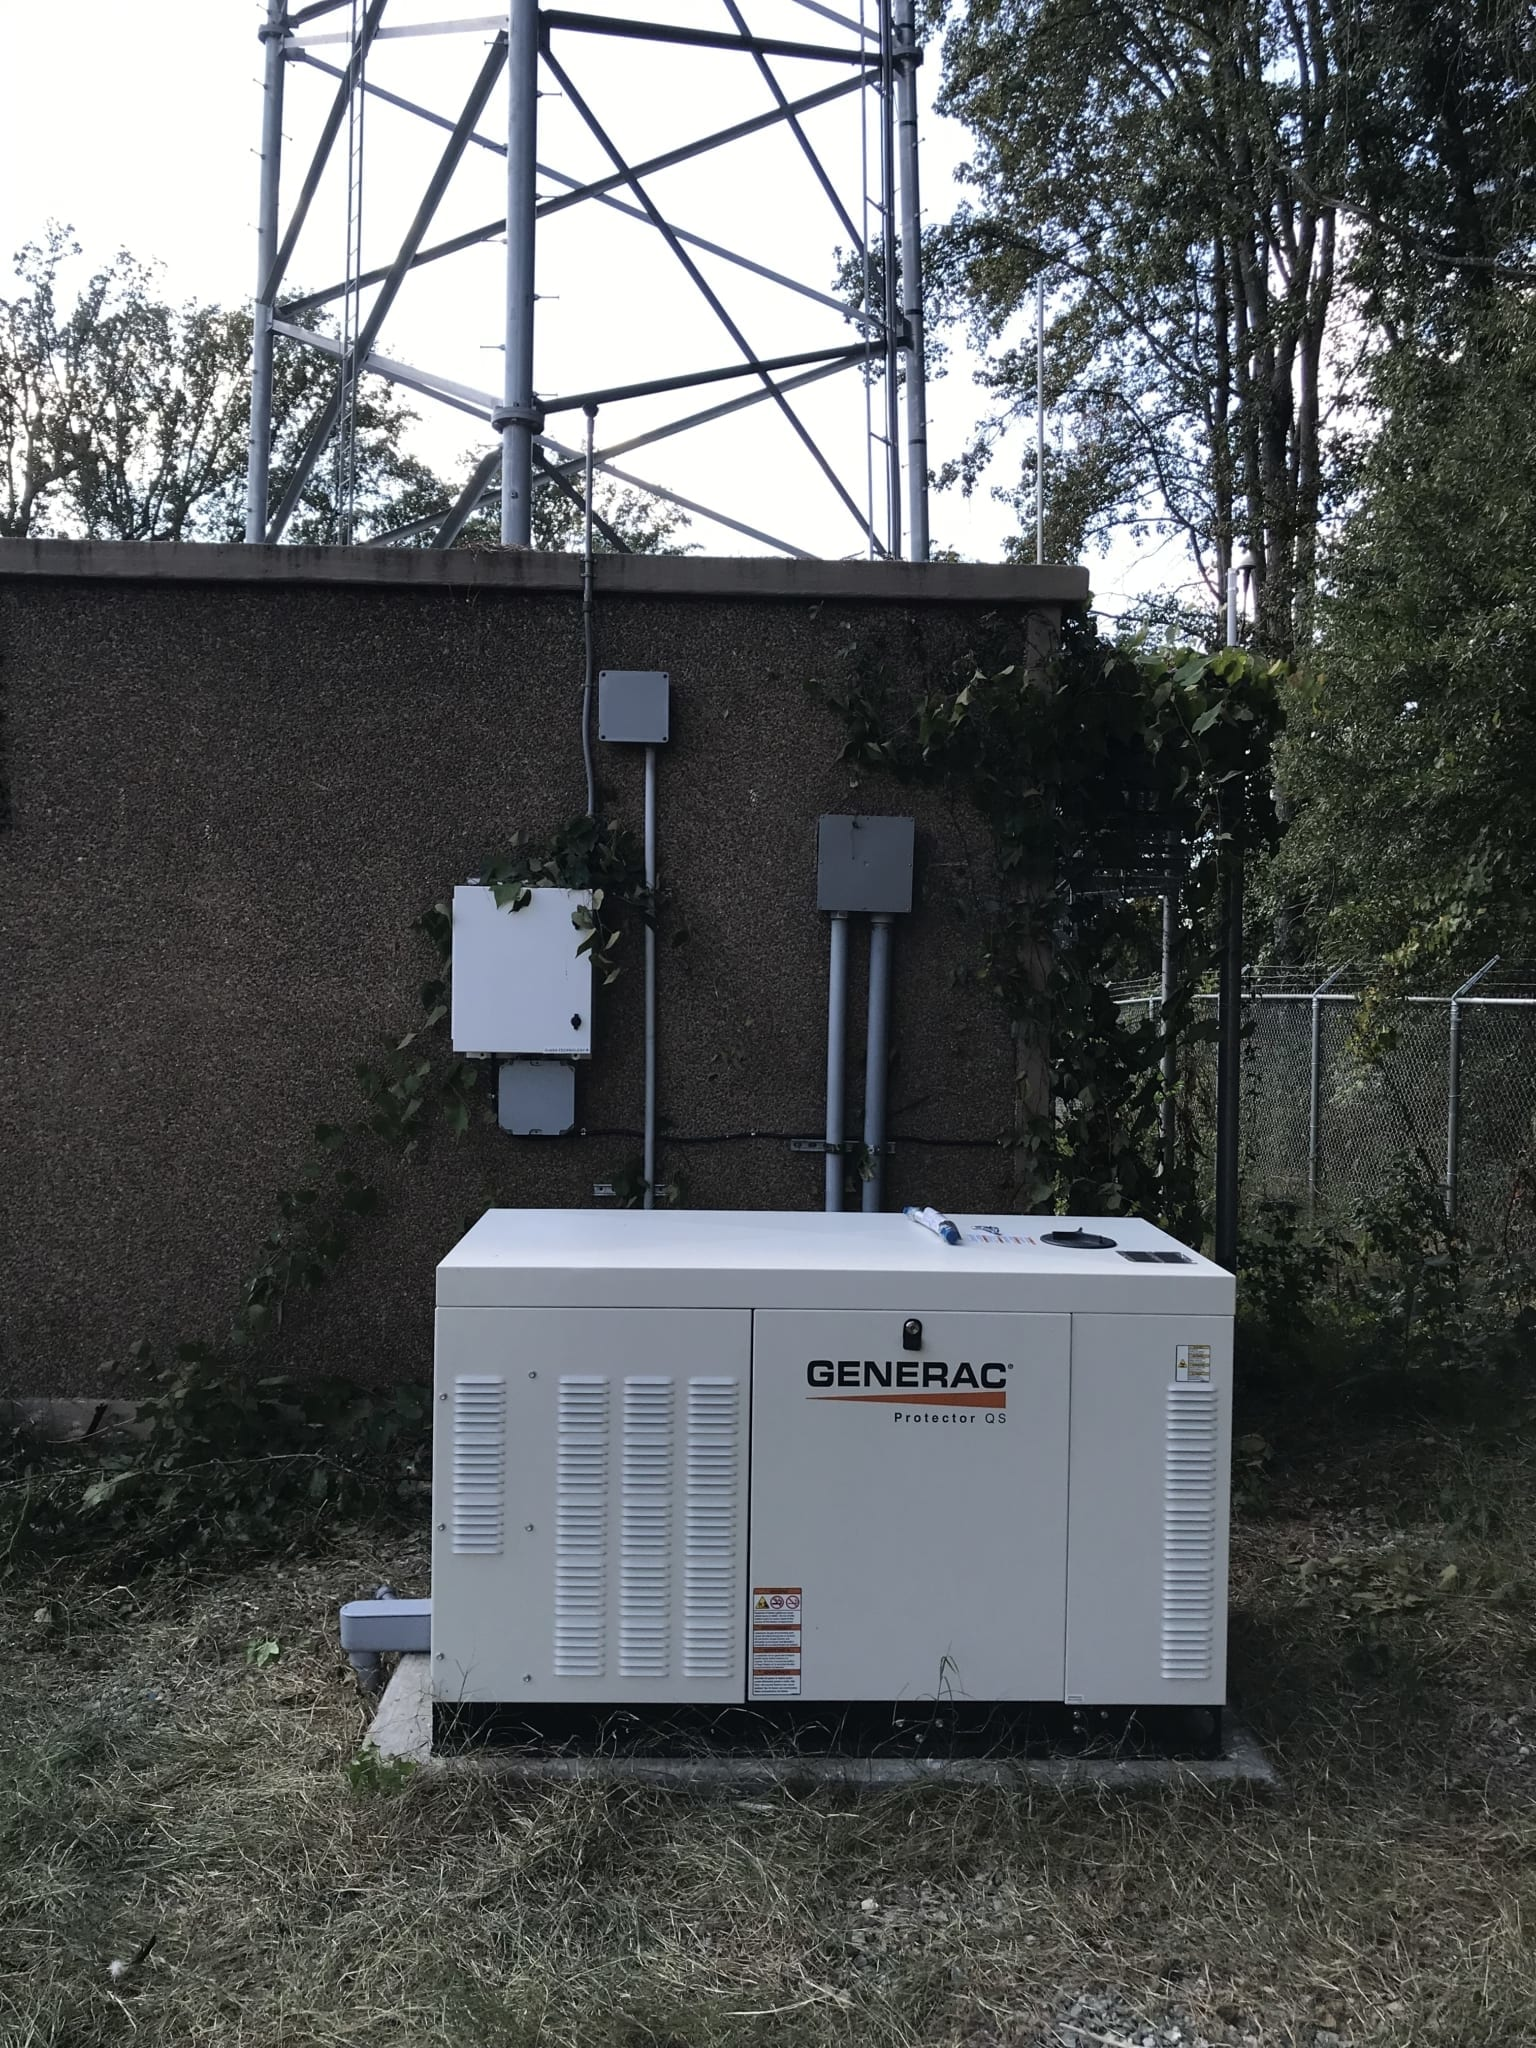 9.23.19 Sussex Generac Automatic Standby Generator (2)